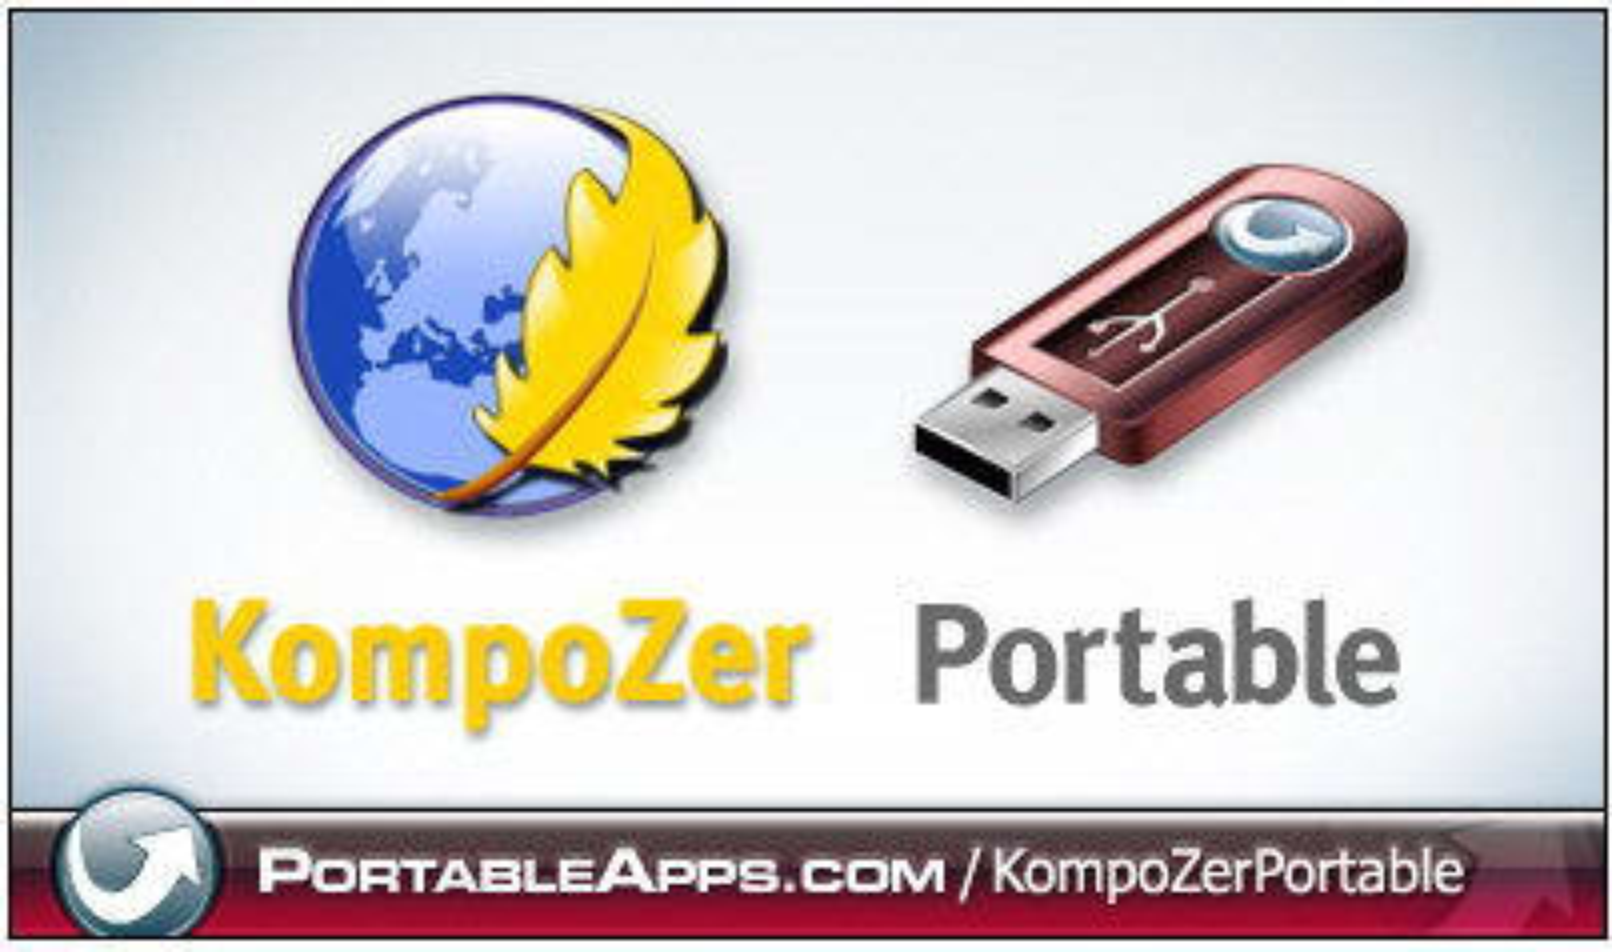 KompoZer Portable